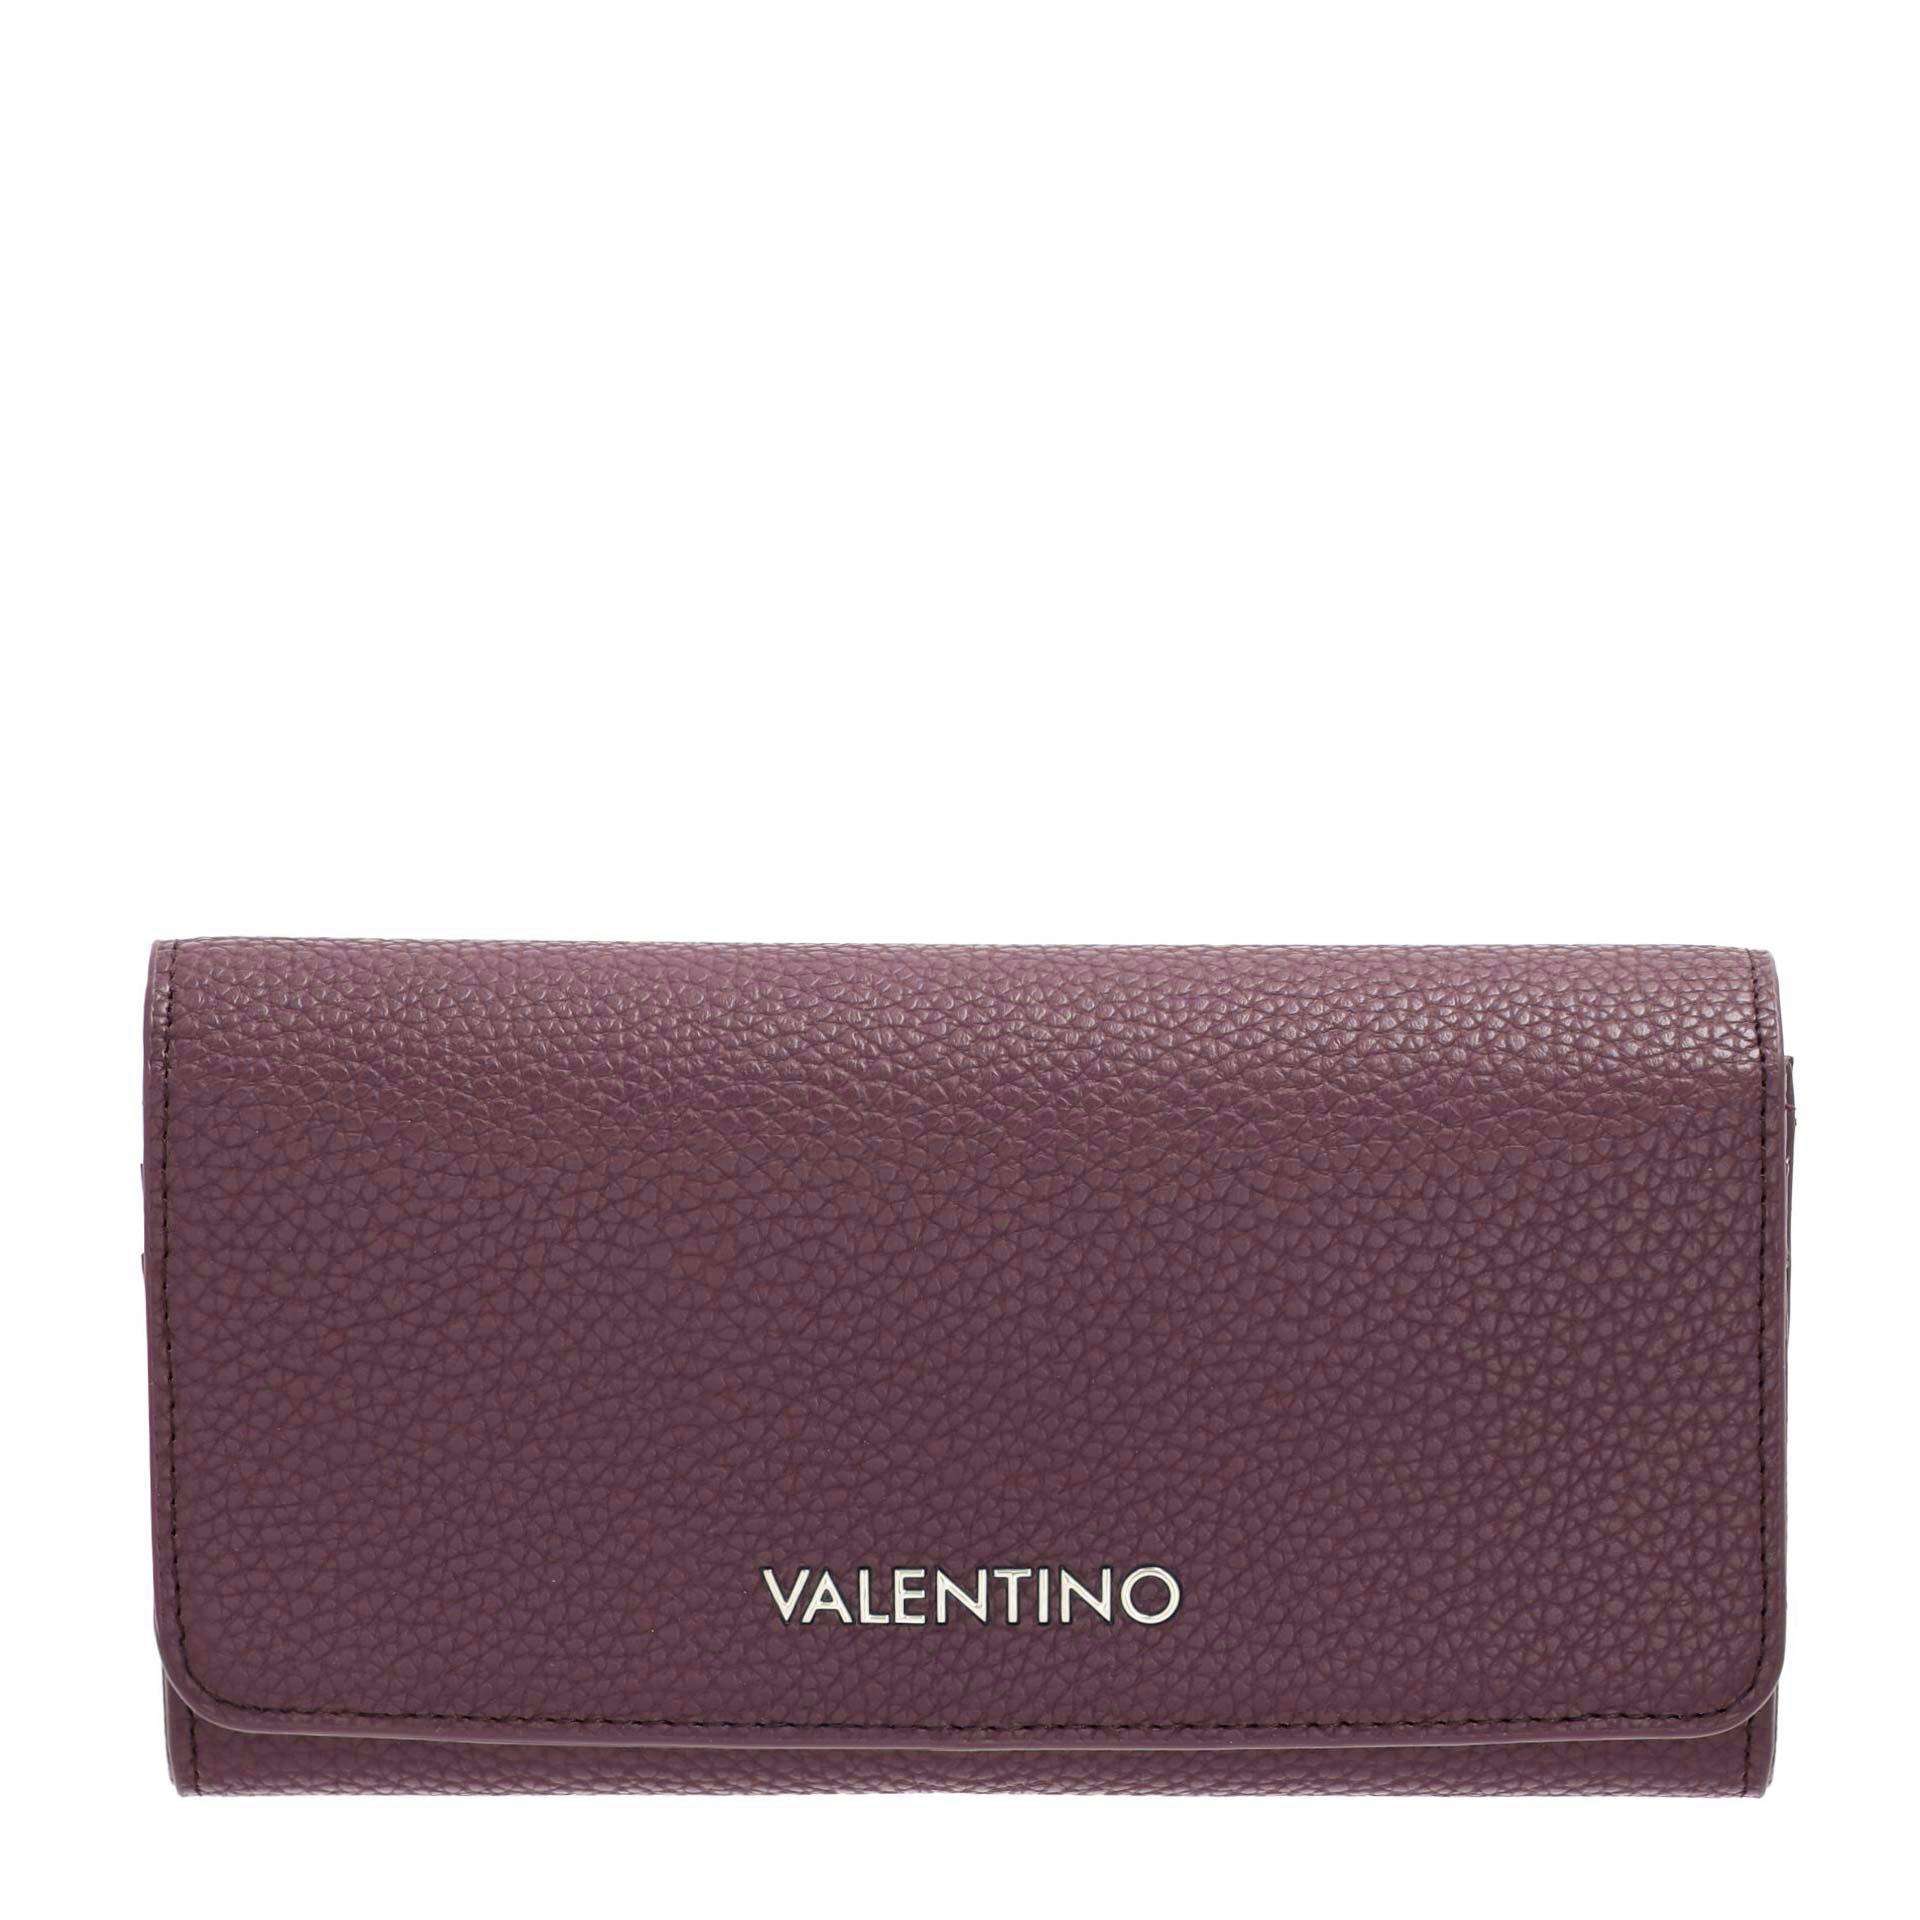 Valentino by Mario Valentino Superman Geldbörse